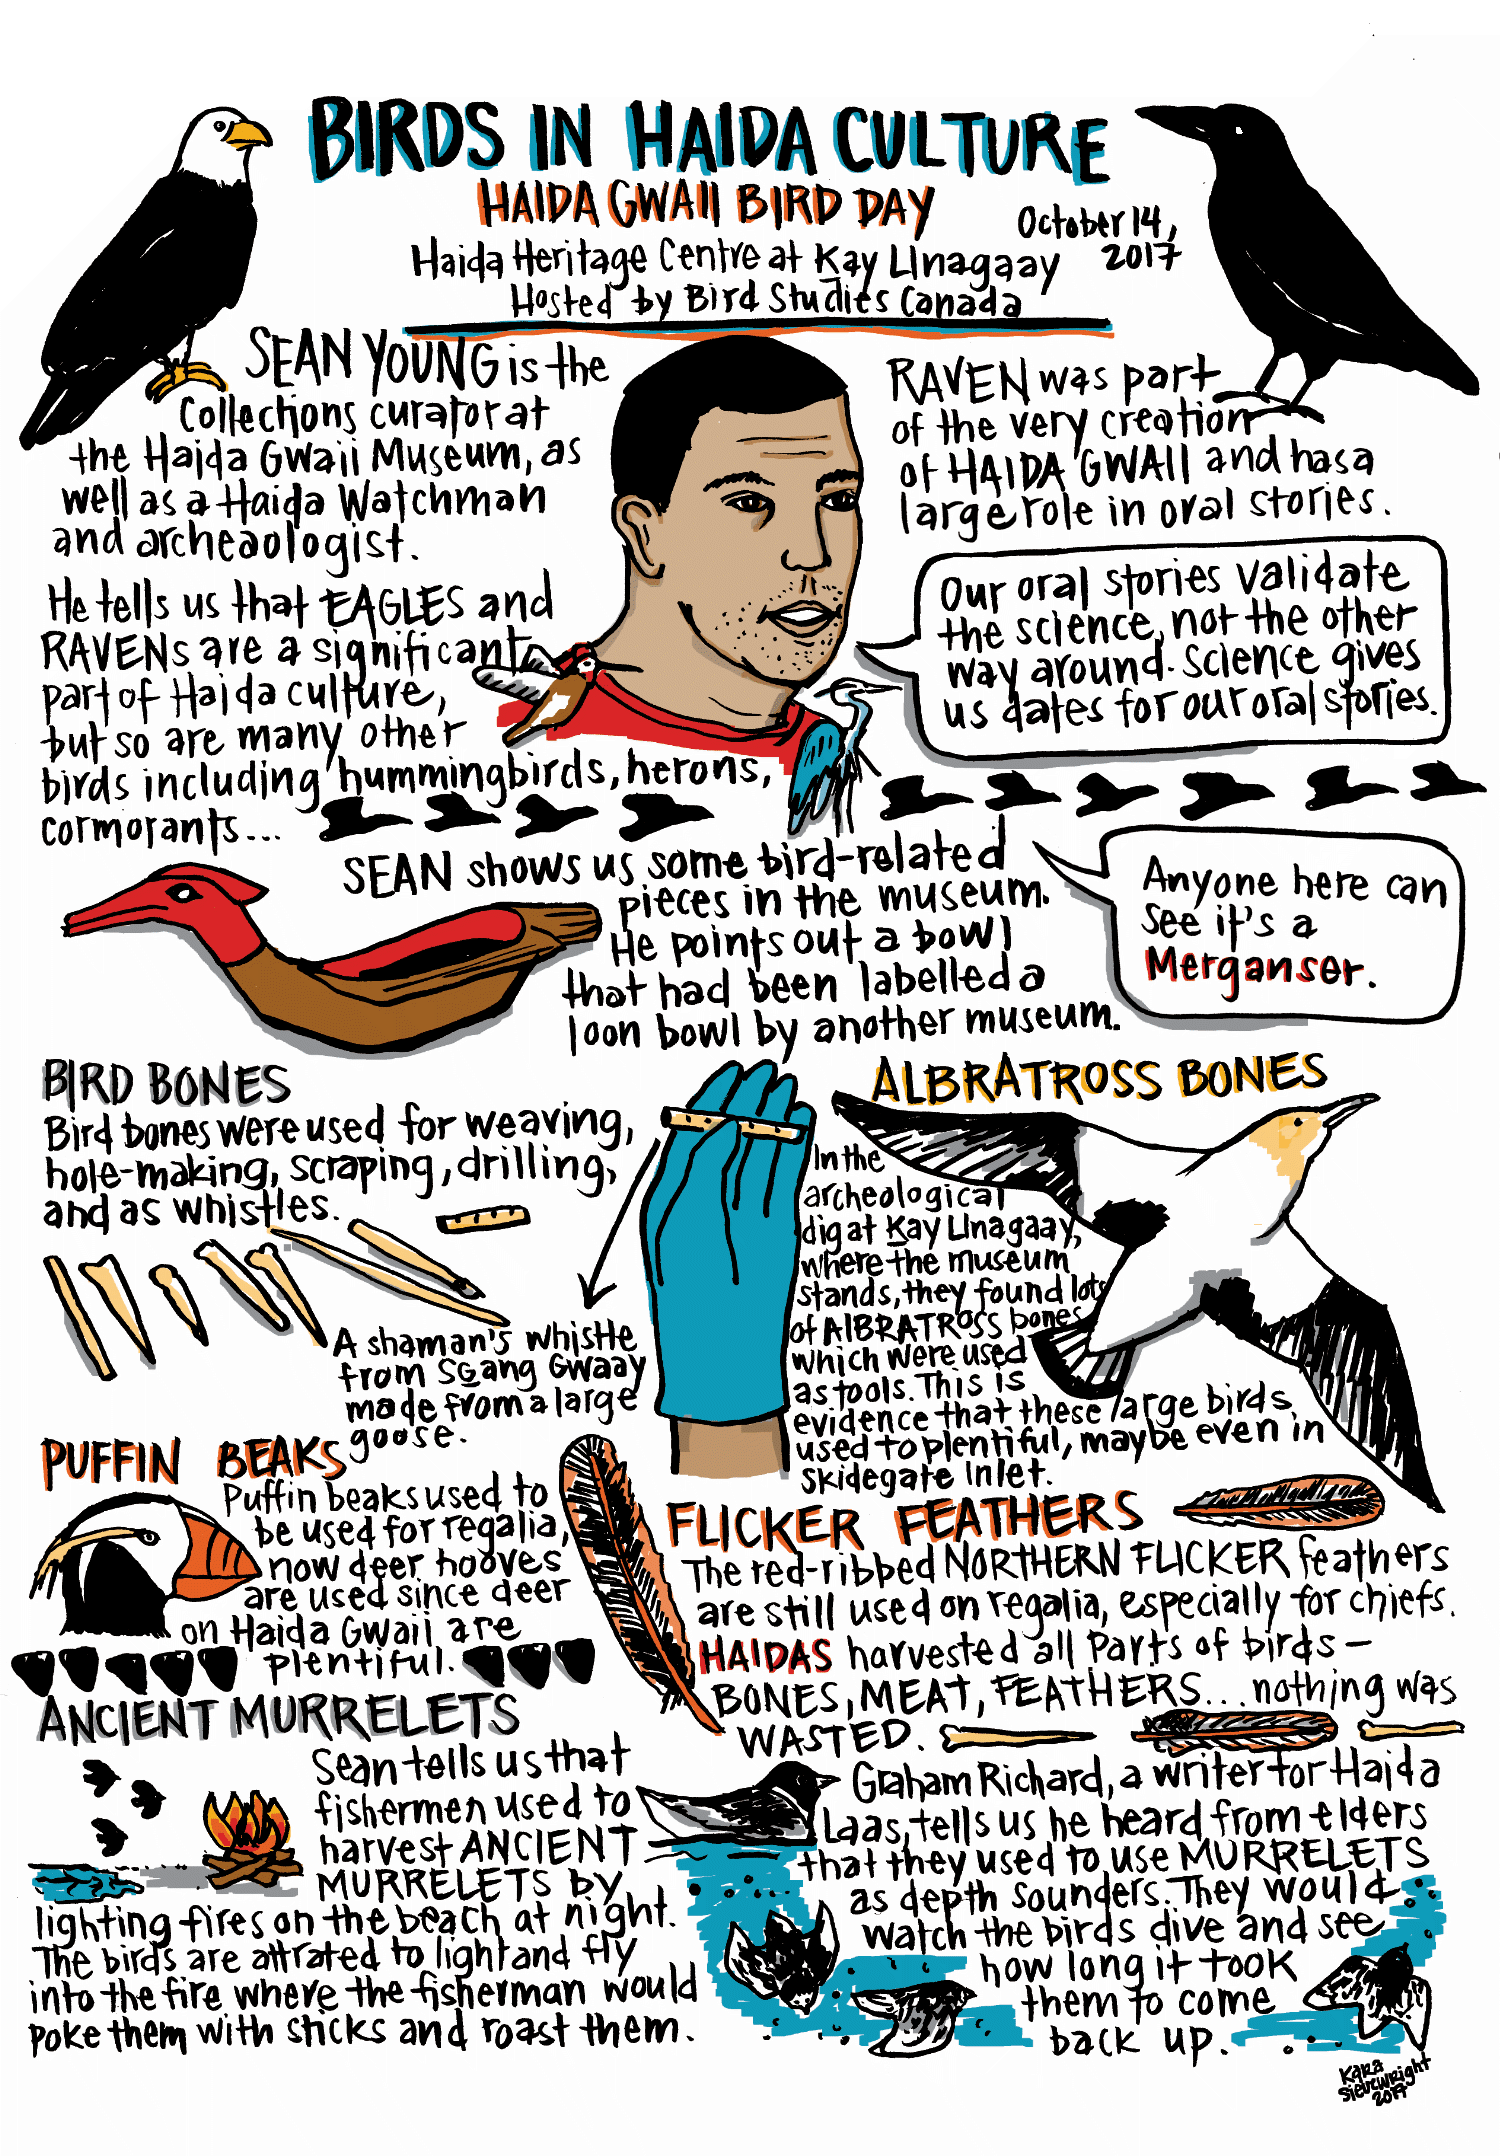 Birdsinhaidaculture-Final-Web.png